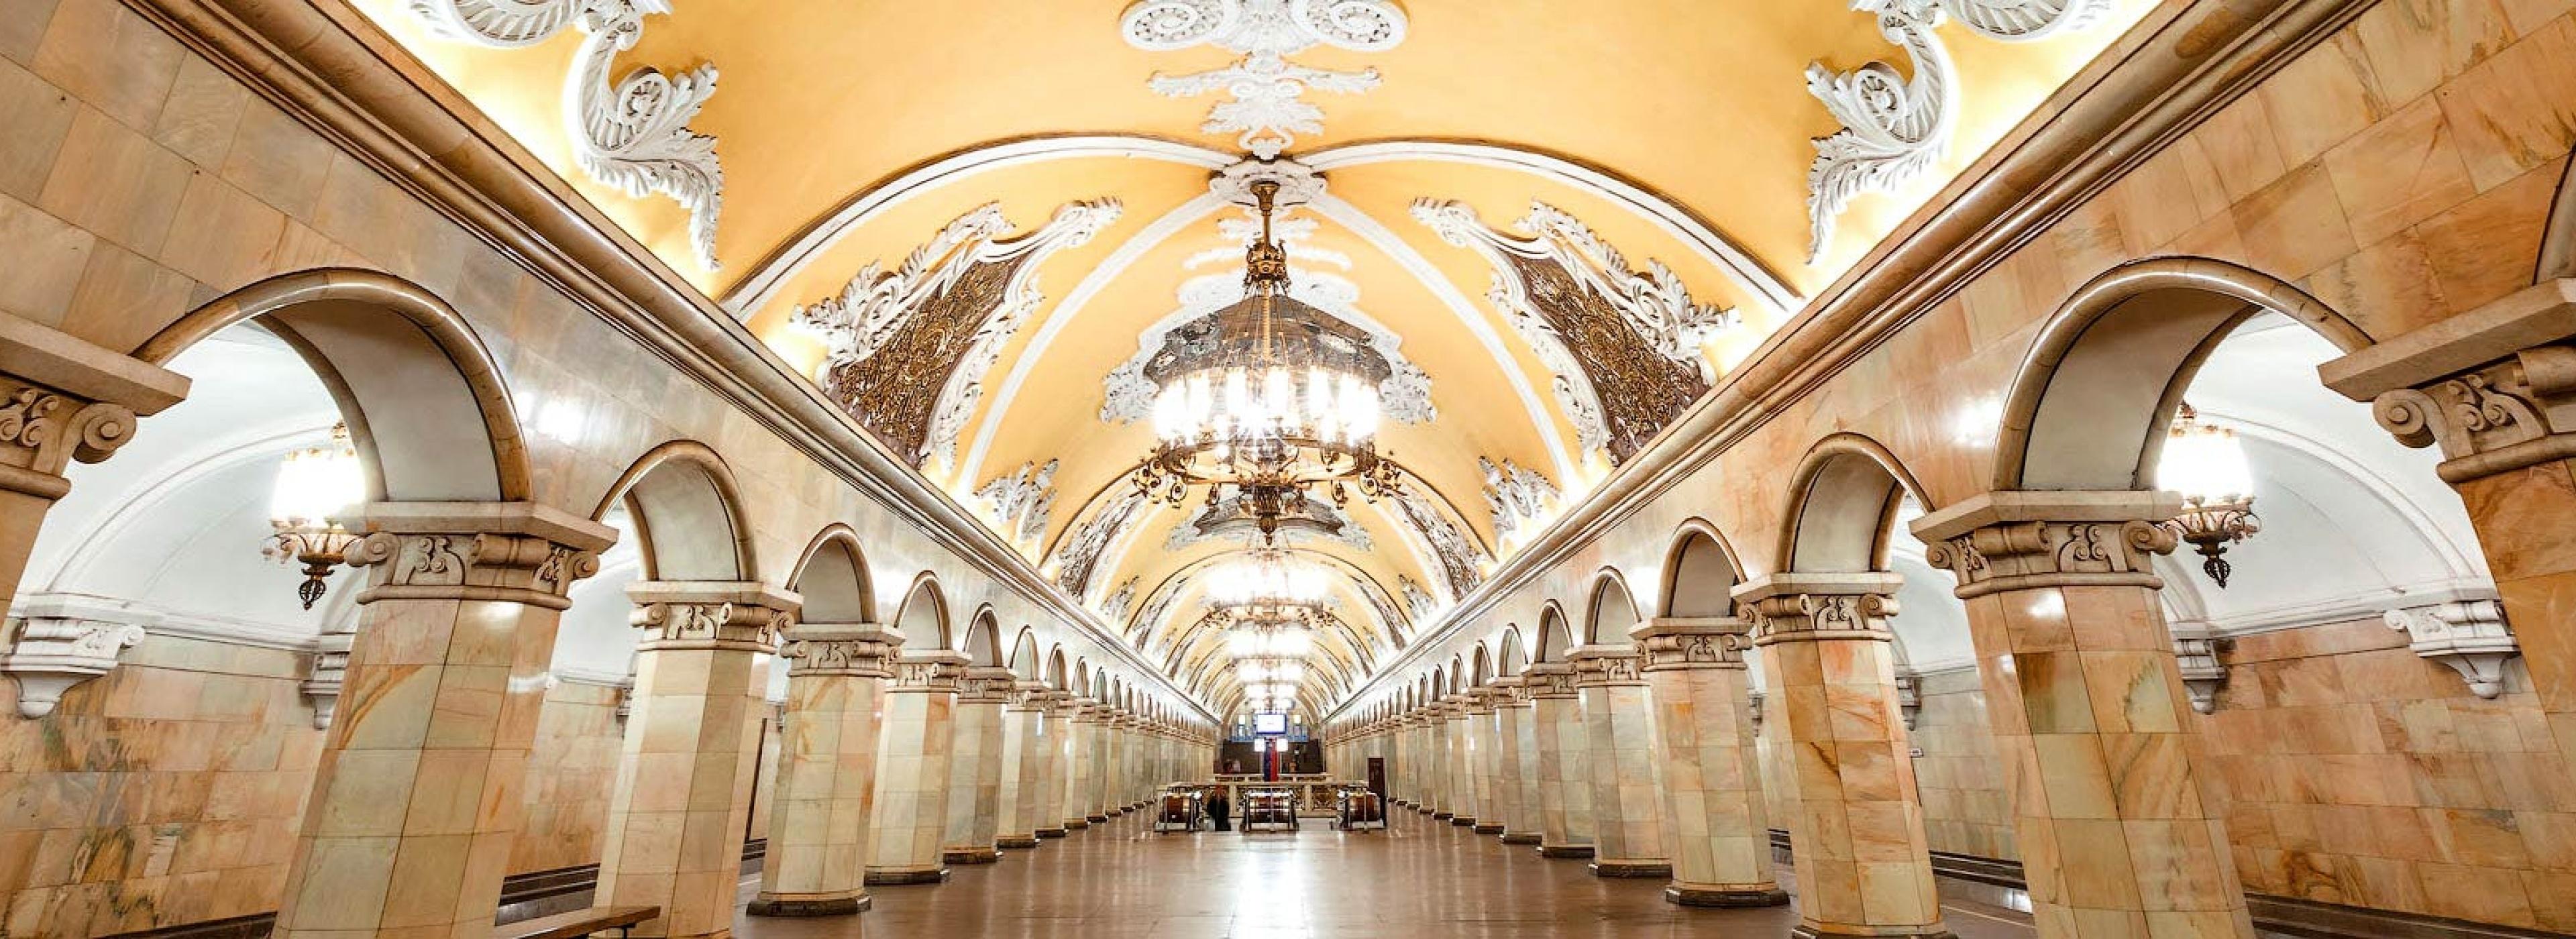 From Saint Petersburg to Beijing Tour Gallery